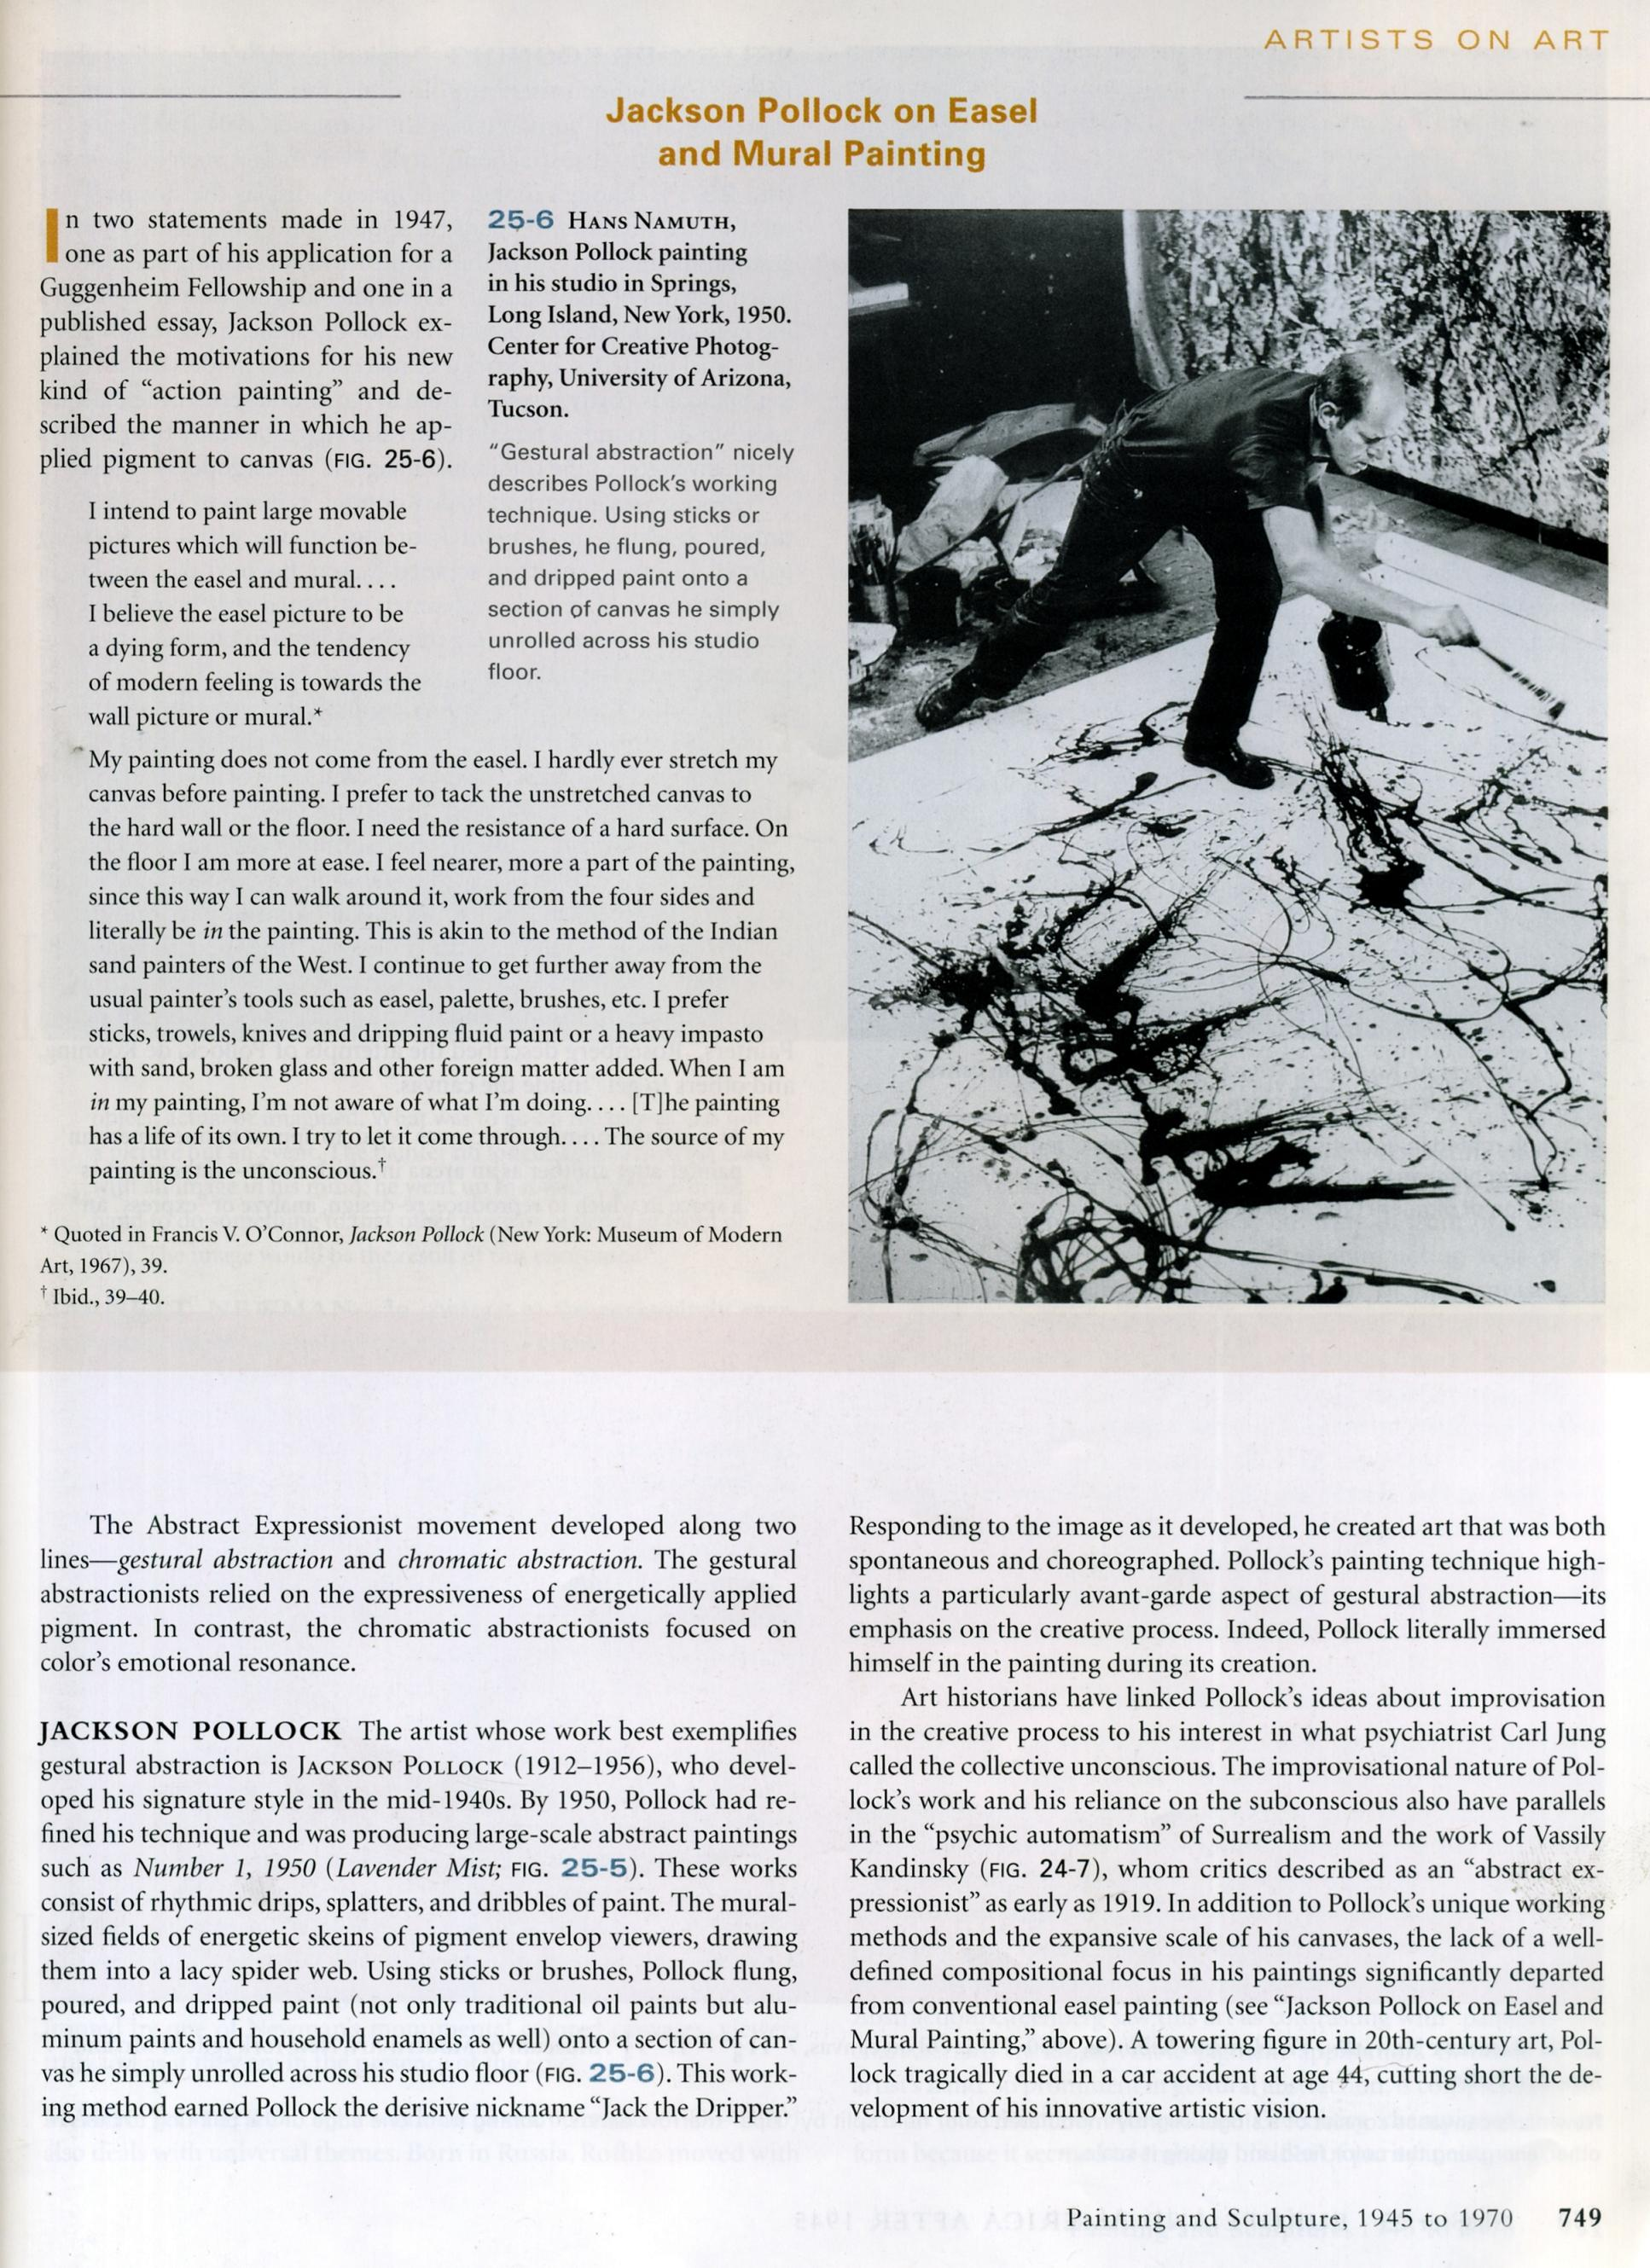 thesis statement on jackson pollock